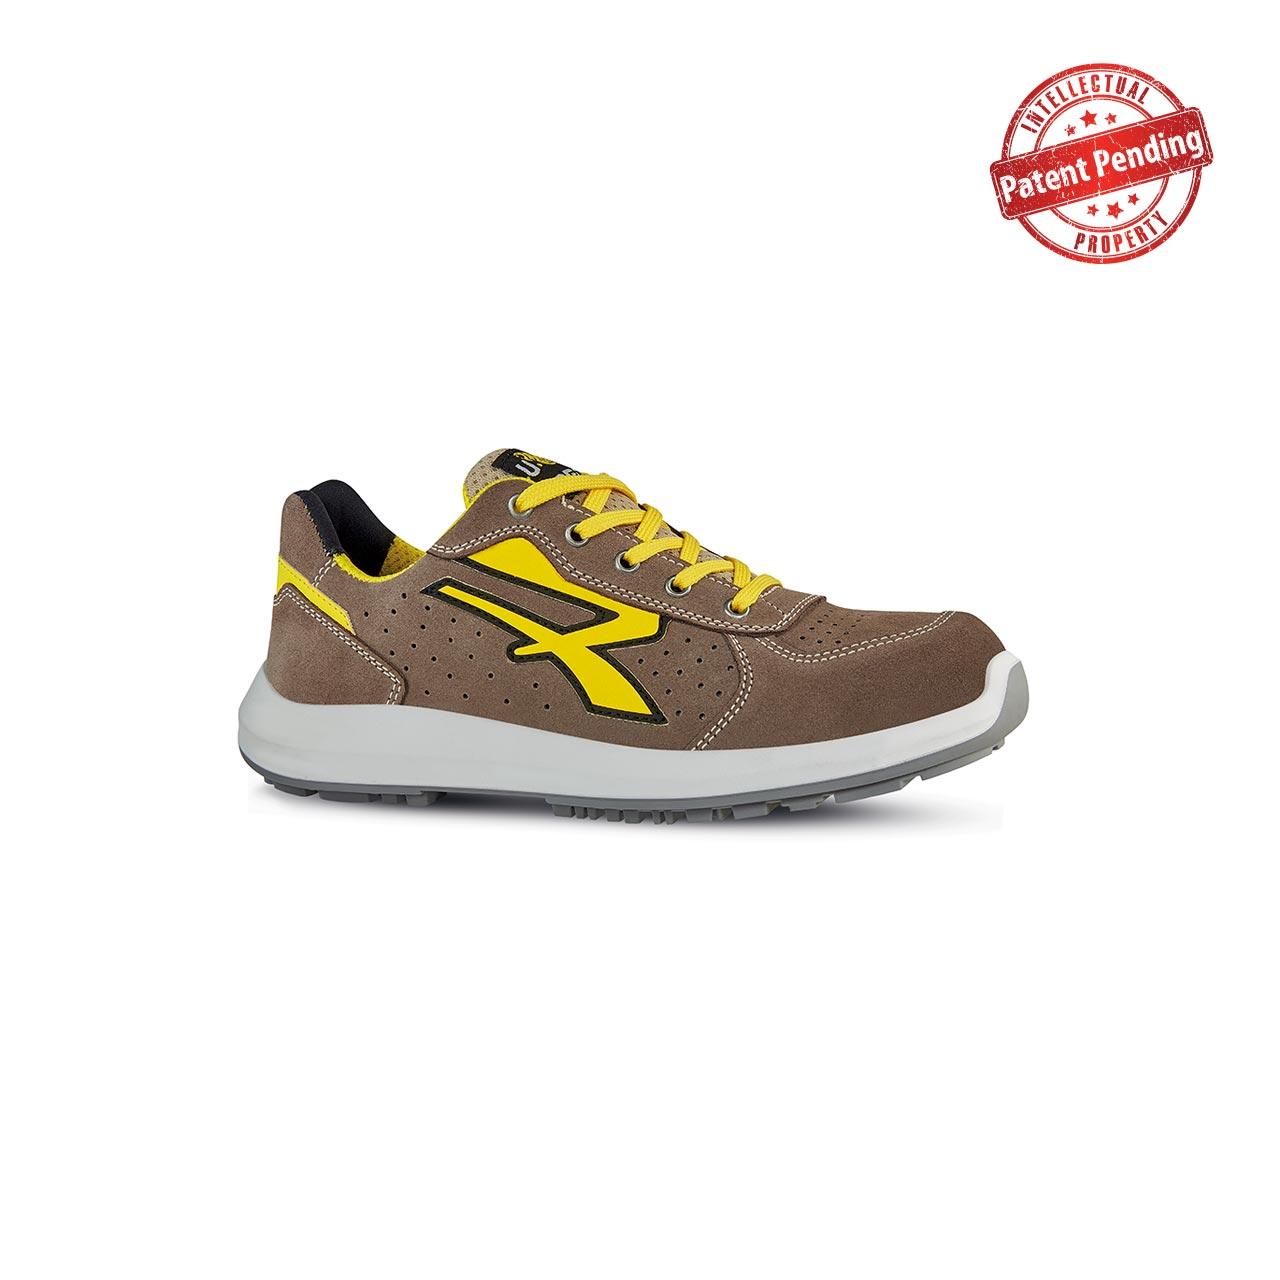 scarpa antinfortunistica upower modello dorado linea redup vista laterale